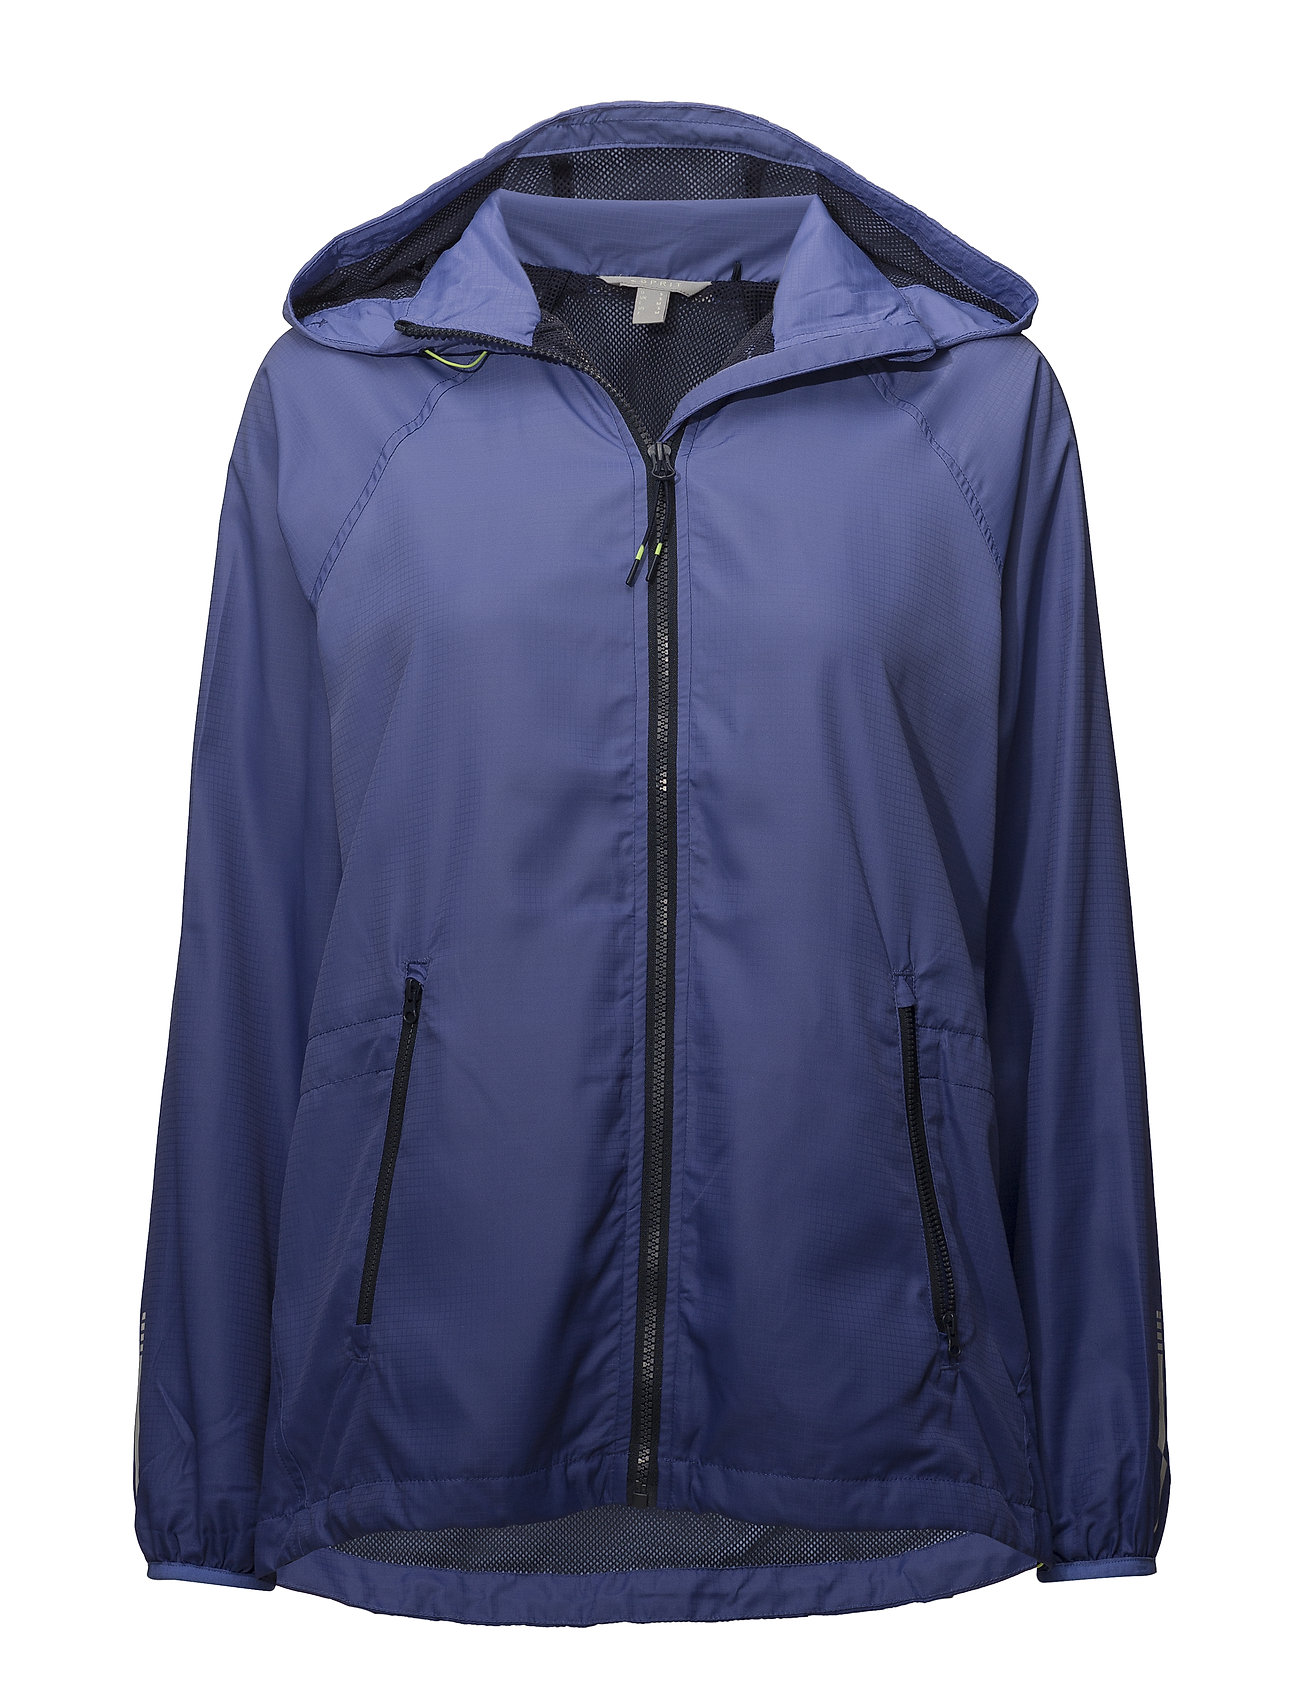 Jackets Outdoor Woven thumbnail